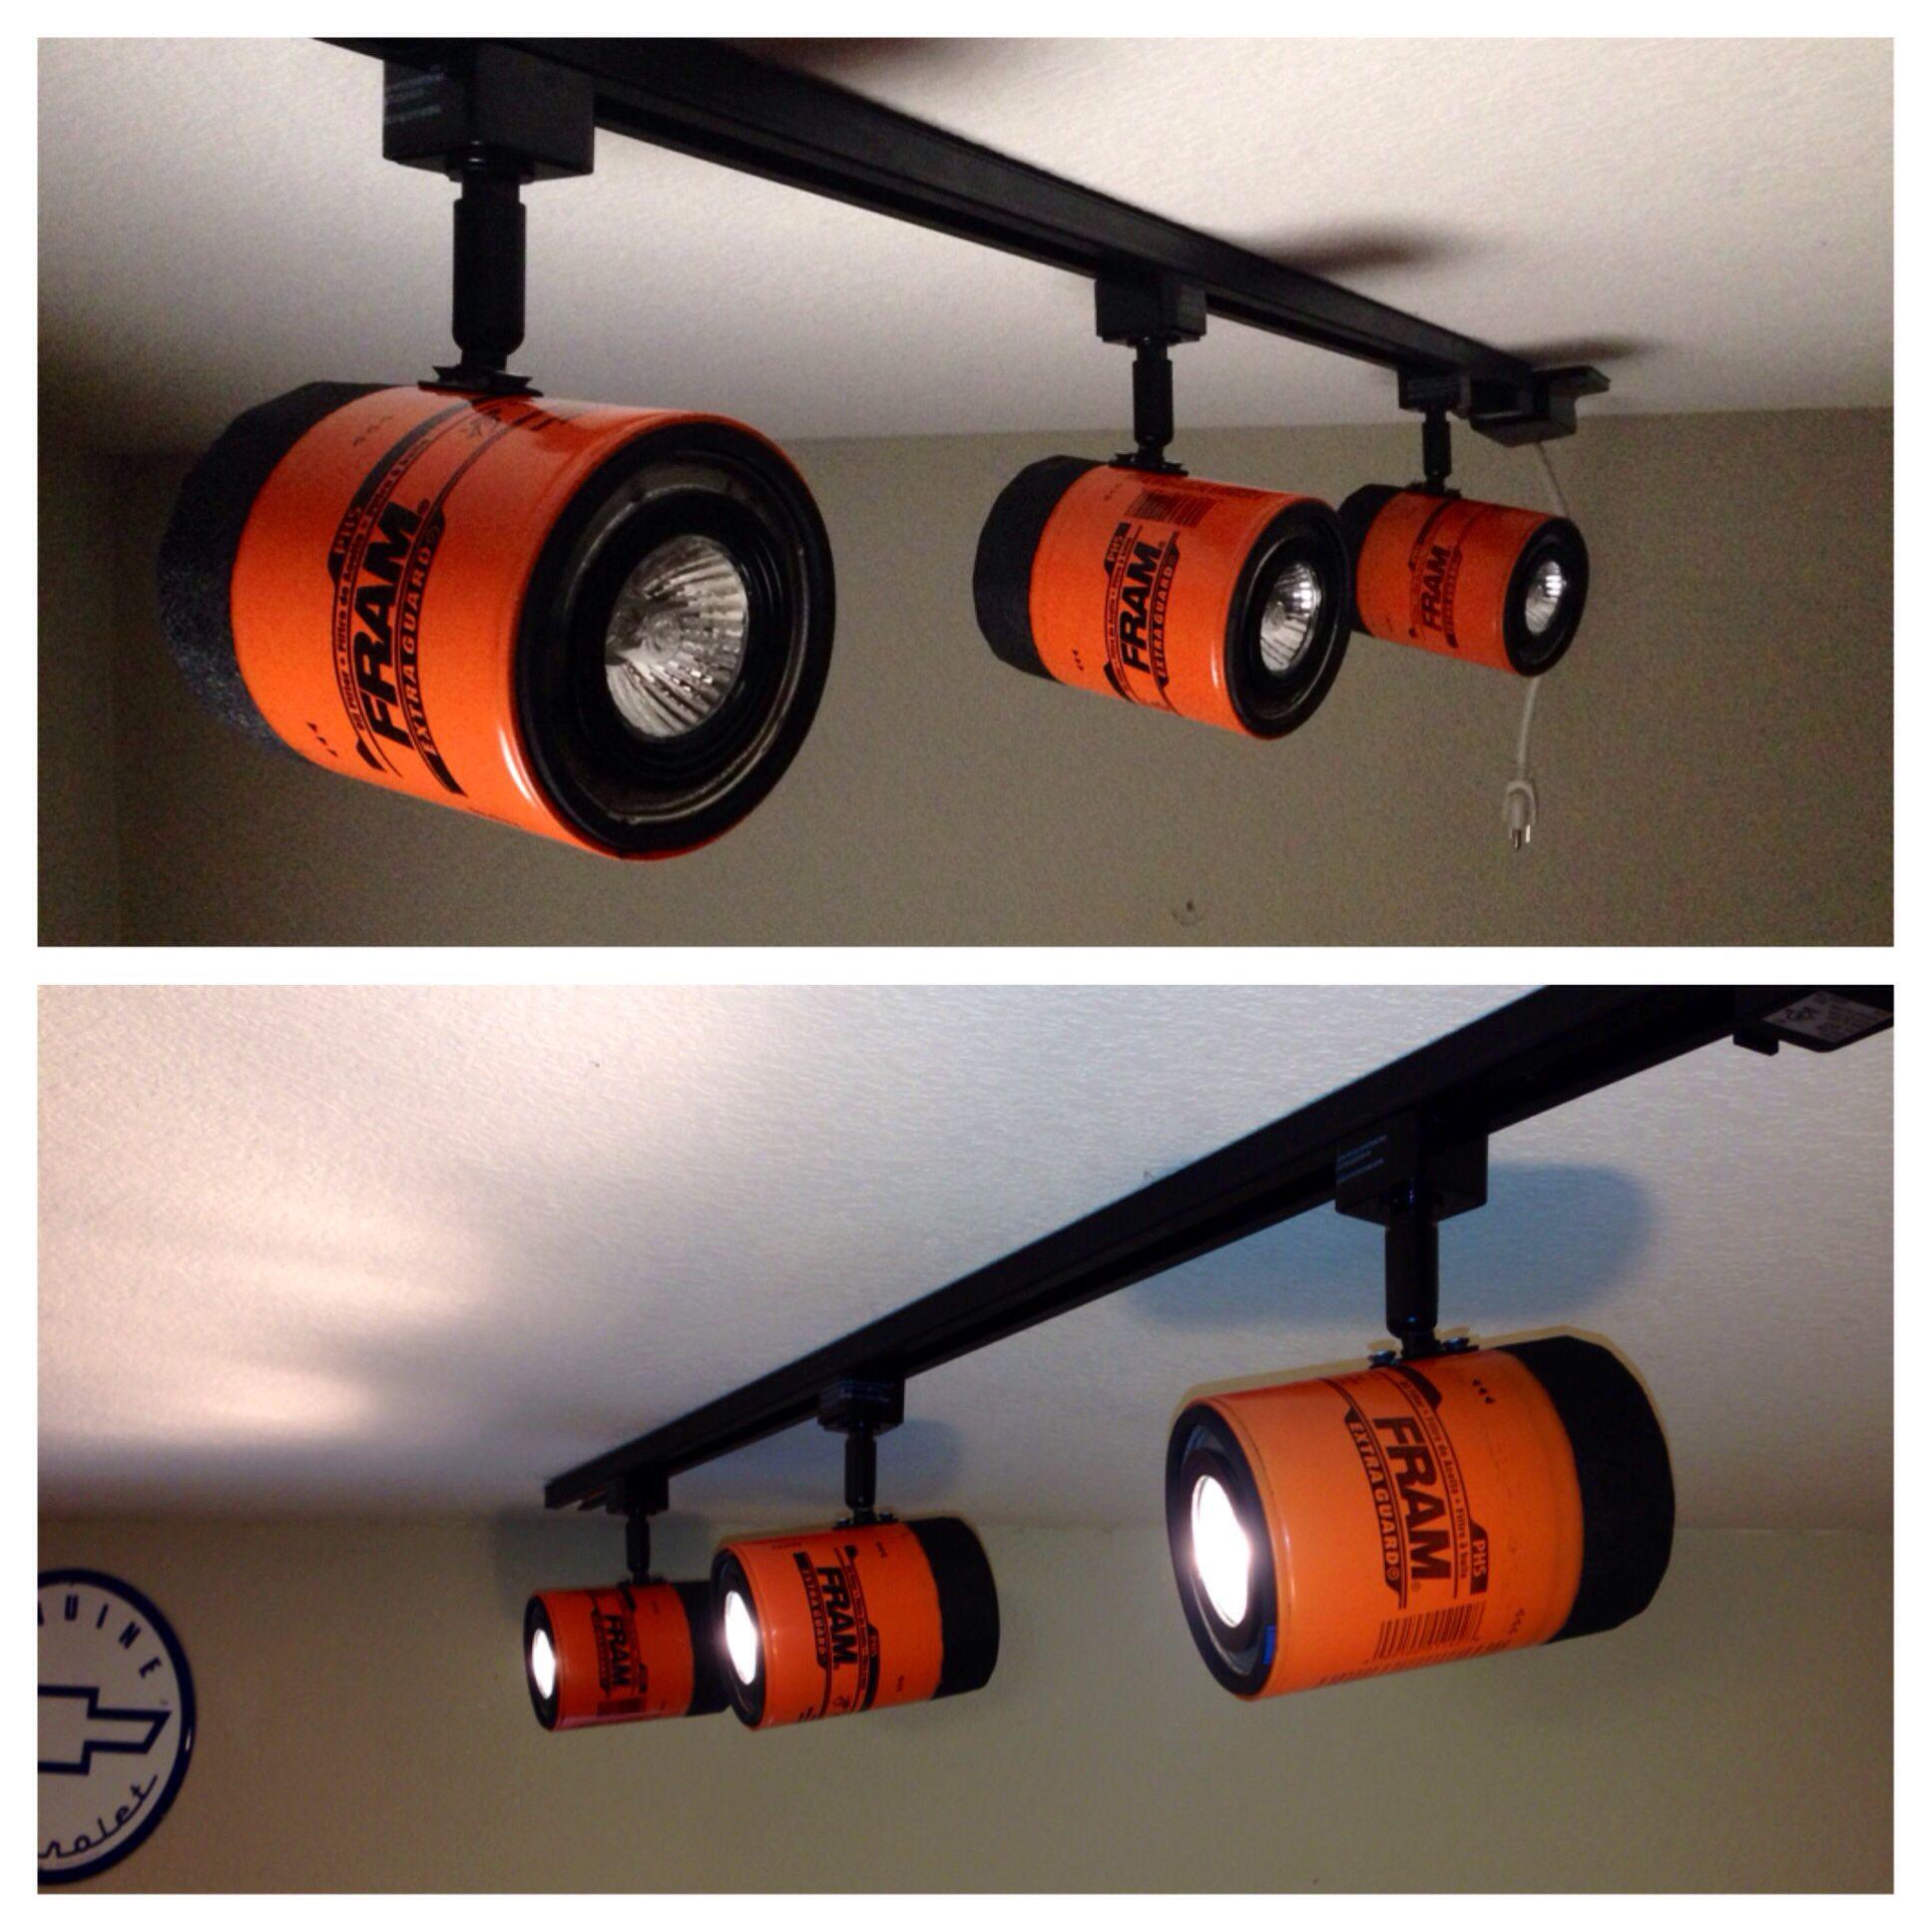 Fram Oil Filers On Track Lighting For Any Home Or Garage Standard Halogen Bulbs